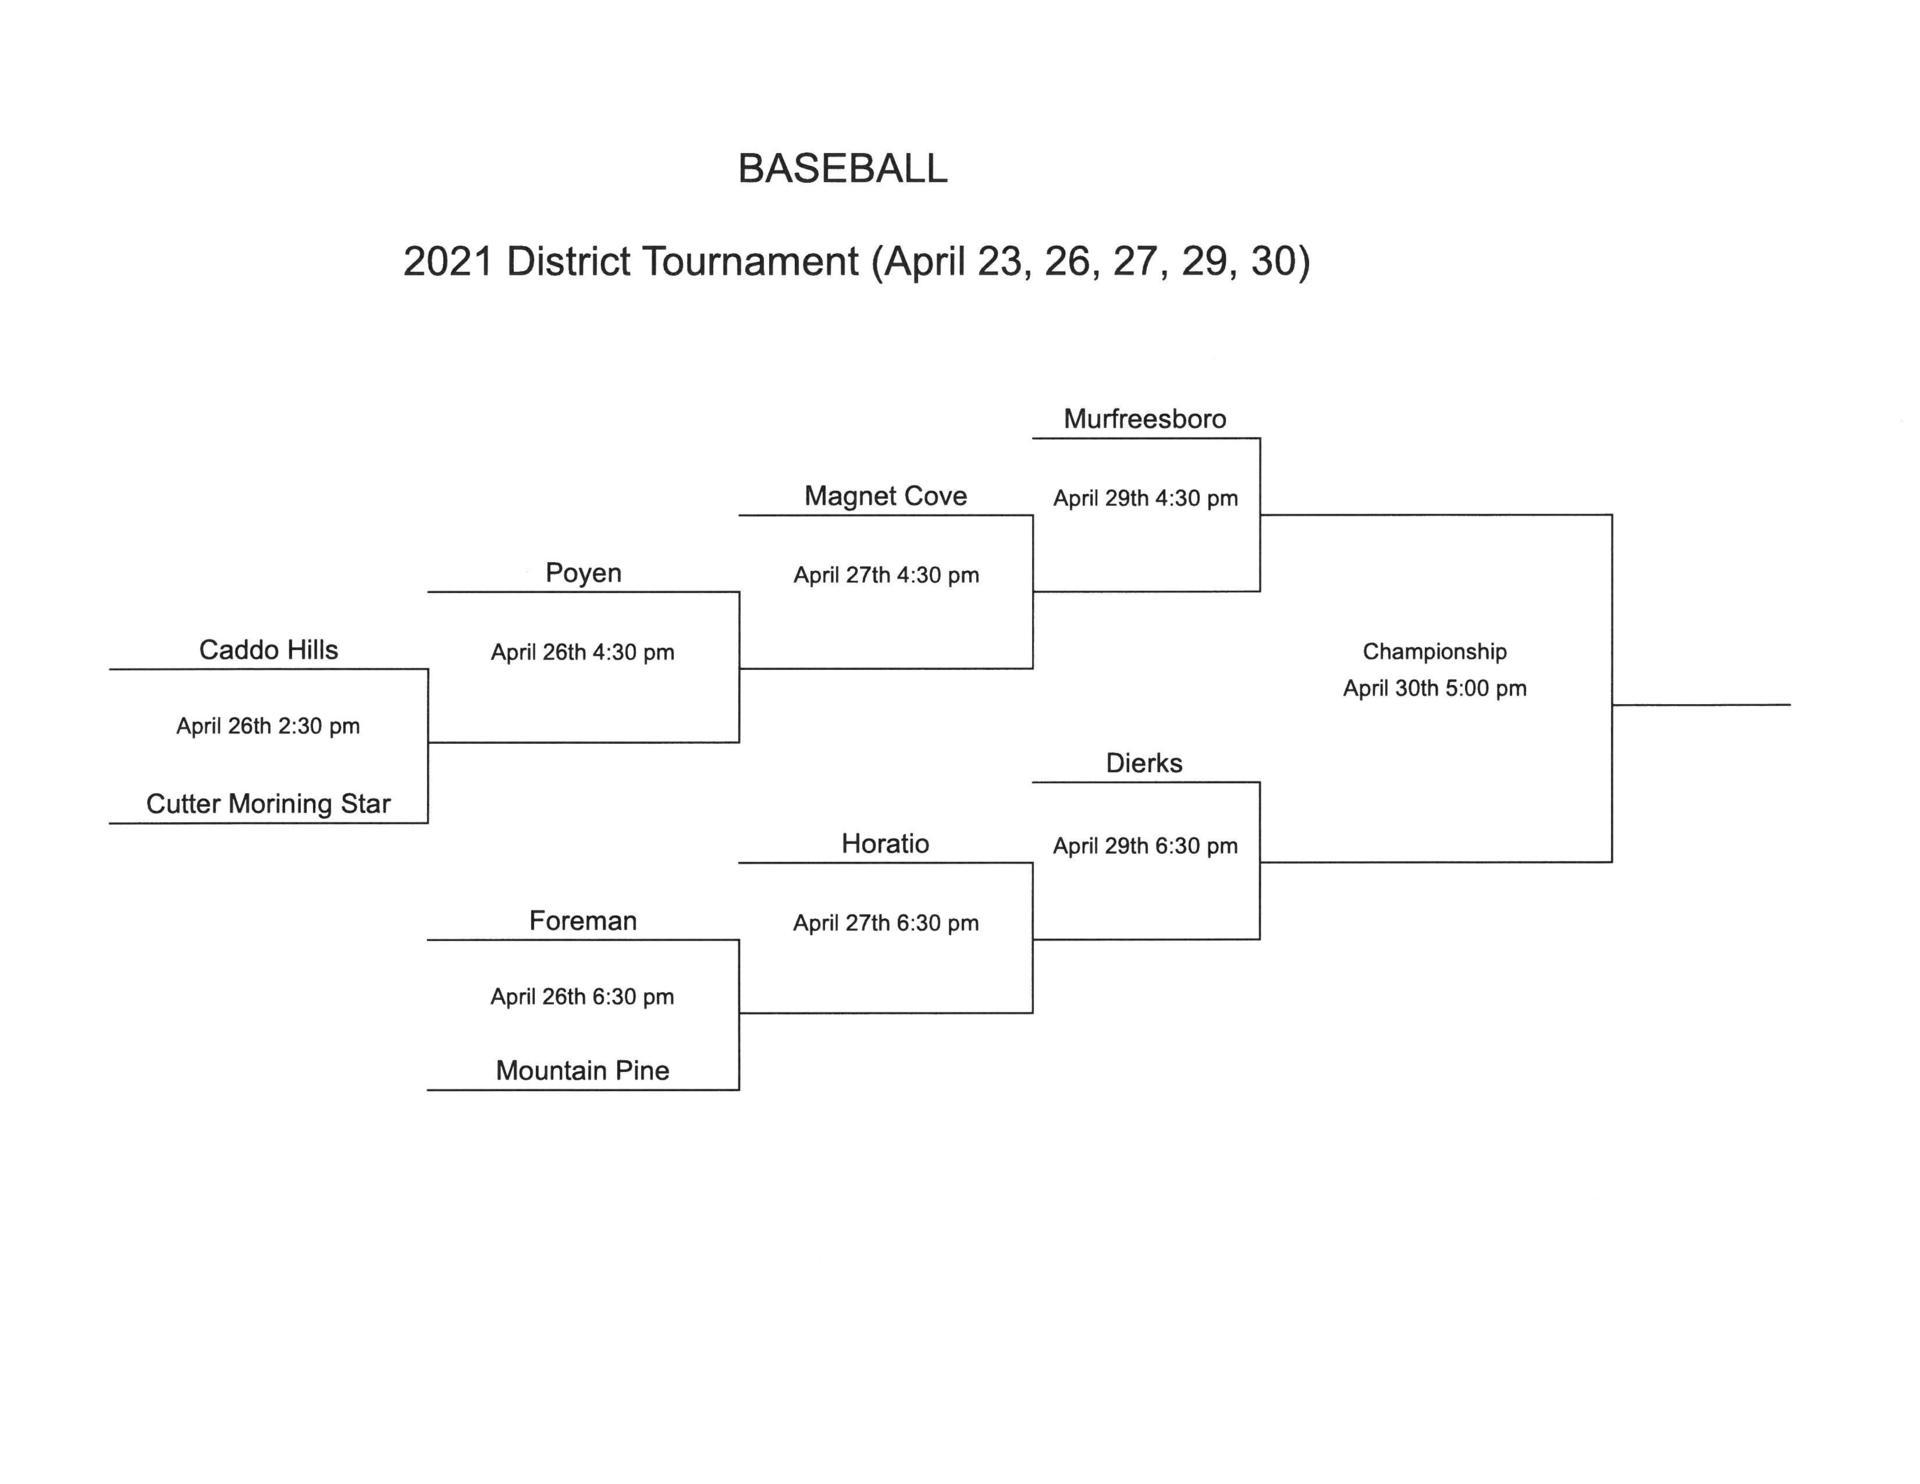 Baseball District Tournament